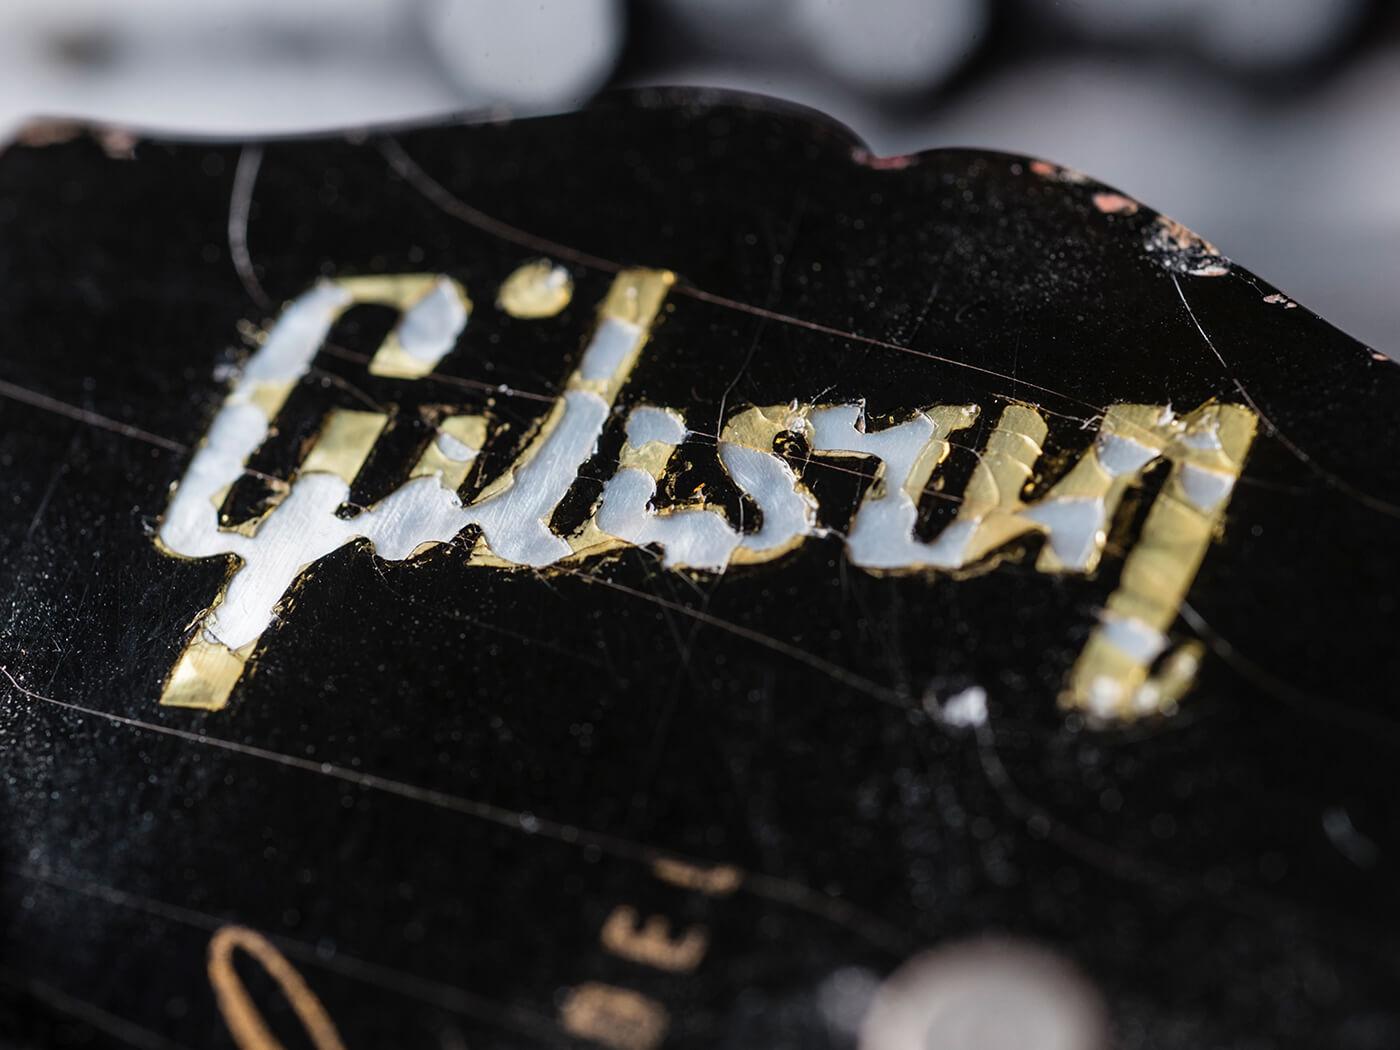 Gary Gand 1960 Gibson Les Paul Standard (Headstock)